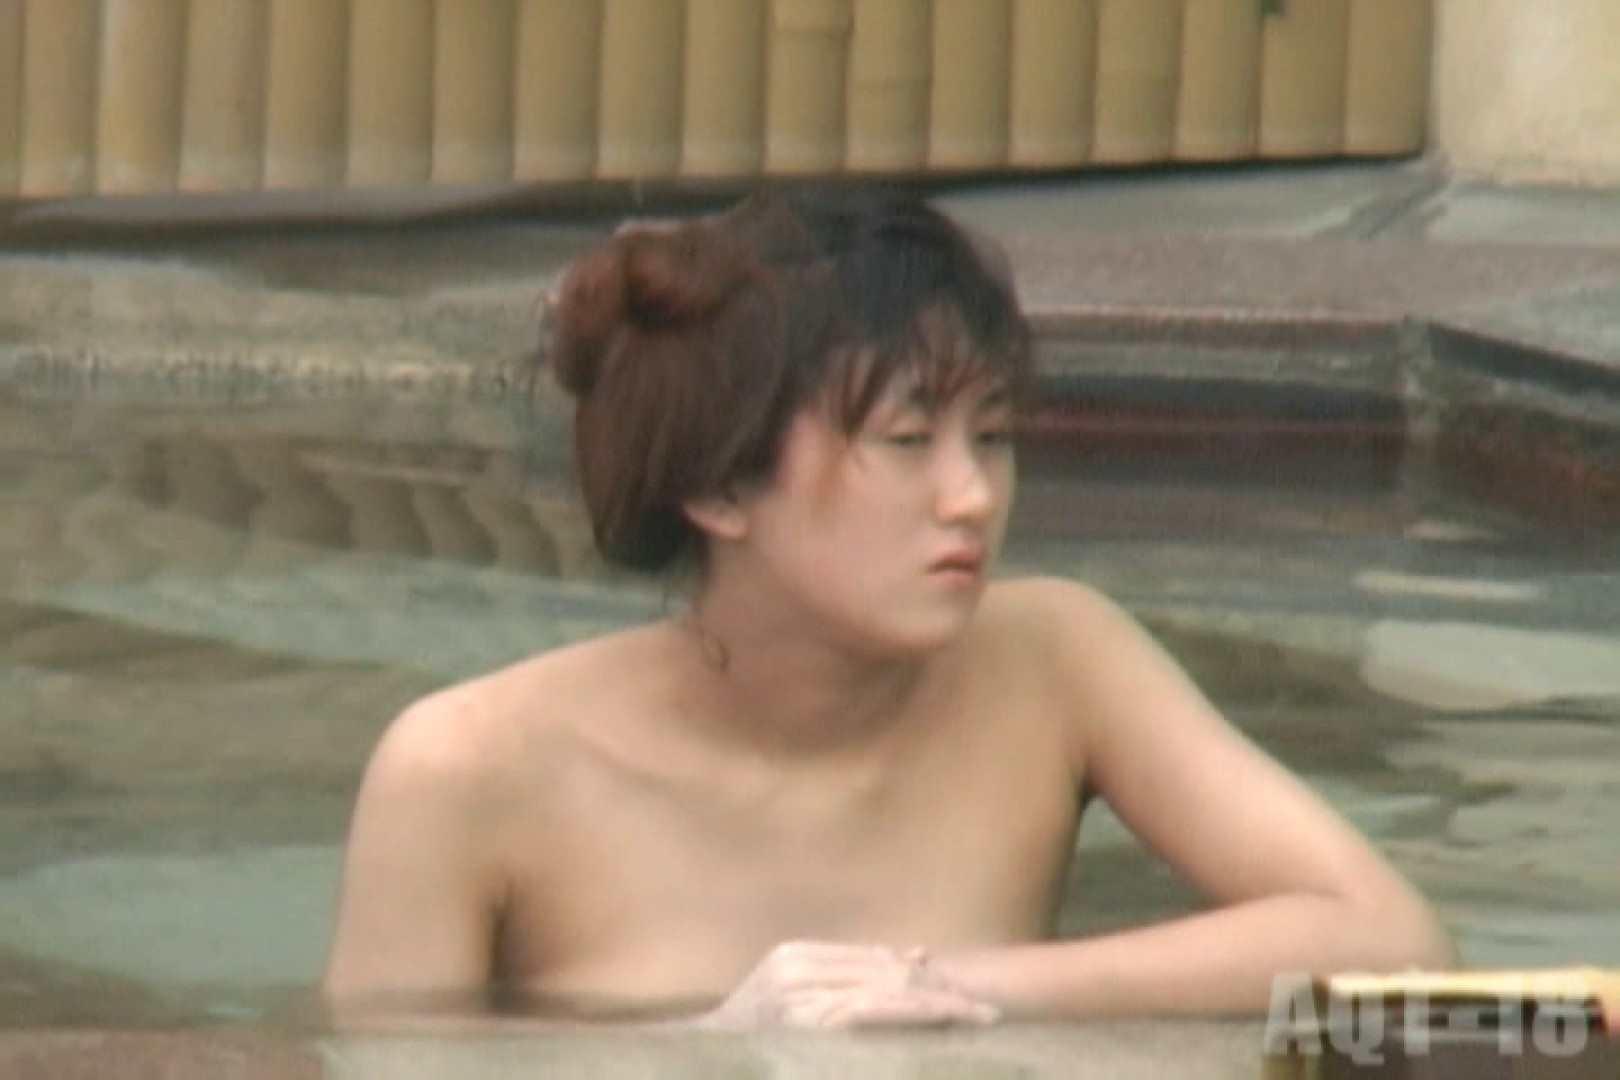 Aquaな露天風呂Vol.862 盗撮師作品   露天風呂突入  99pic 88